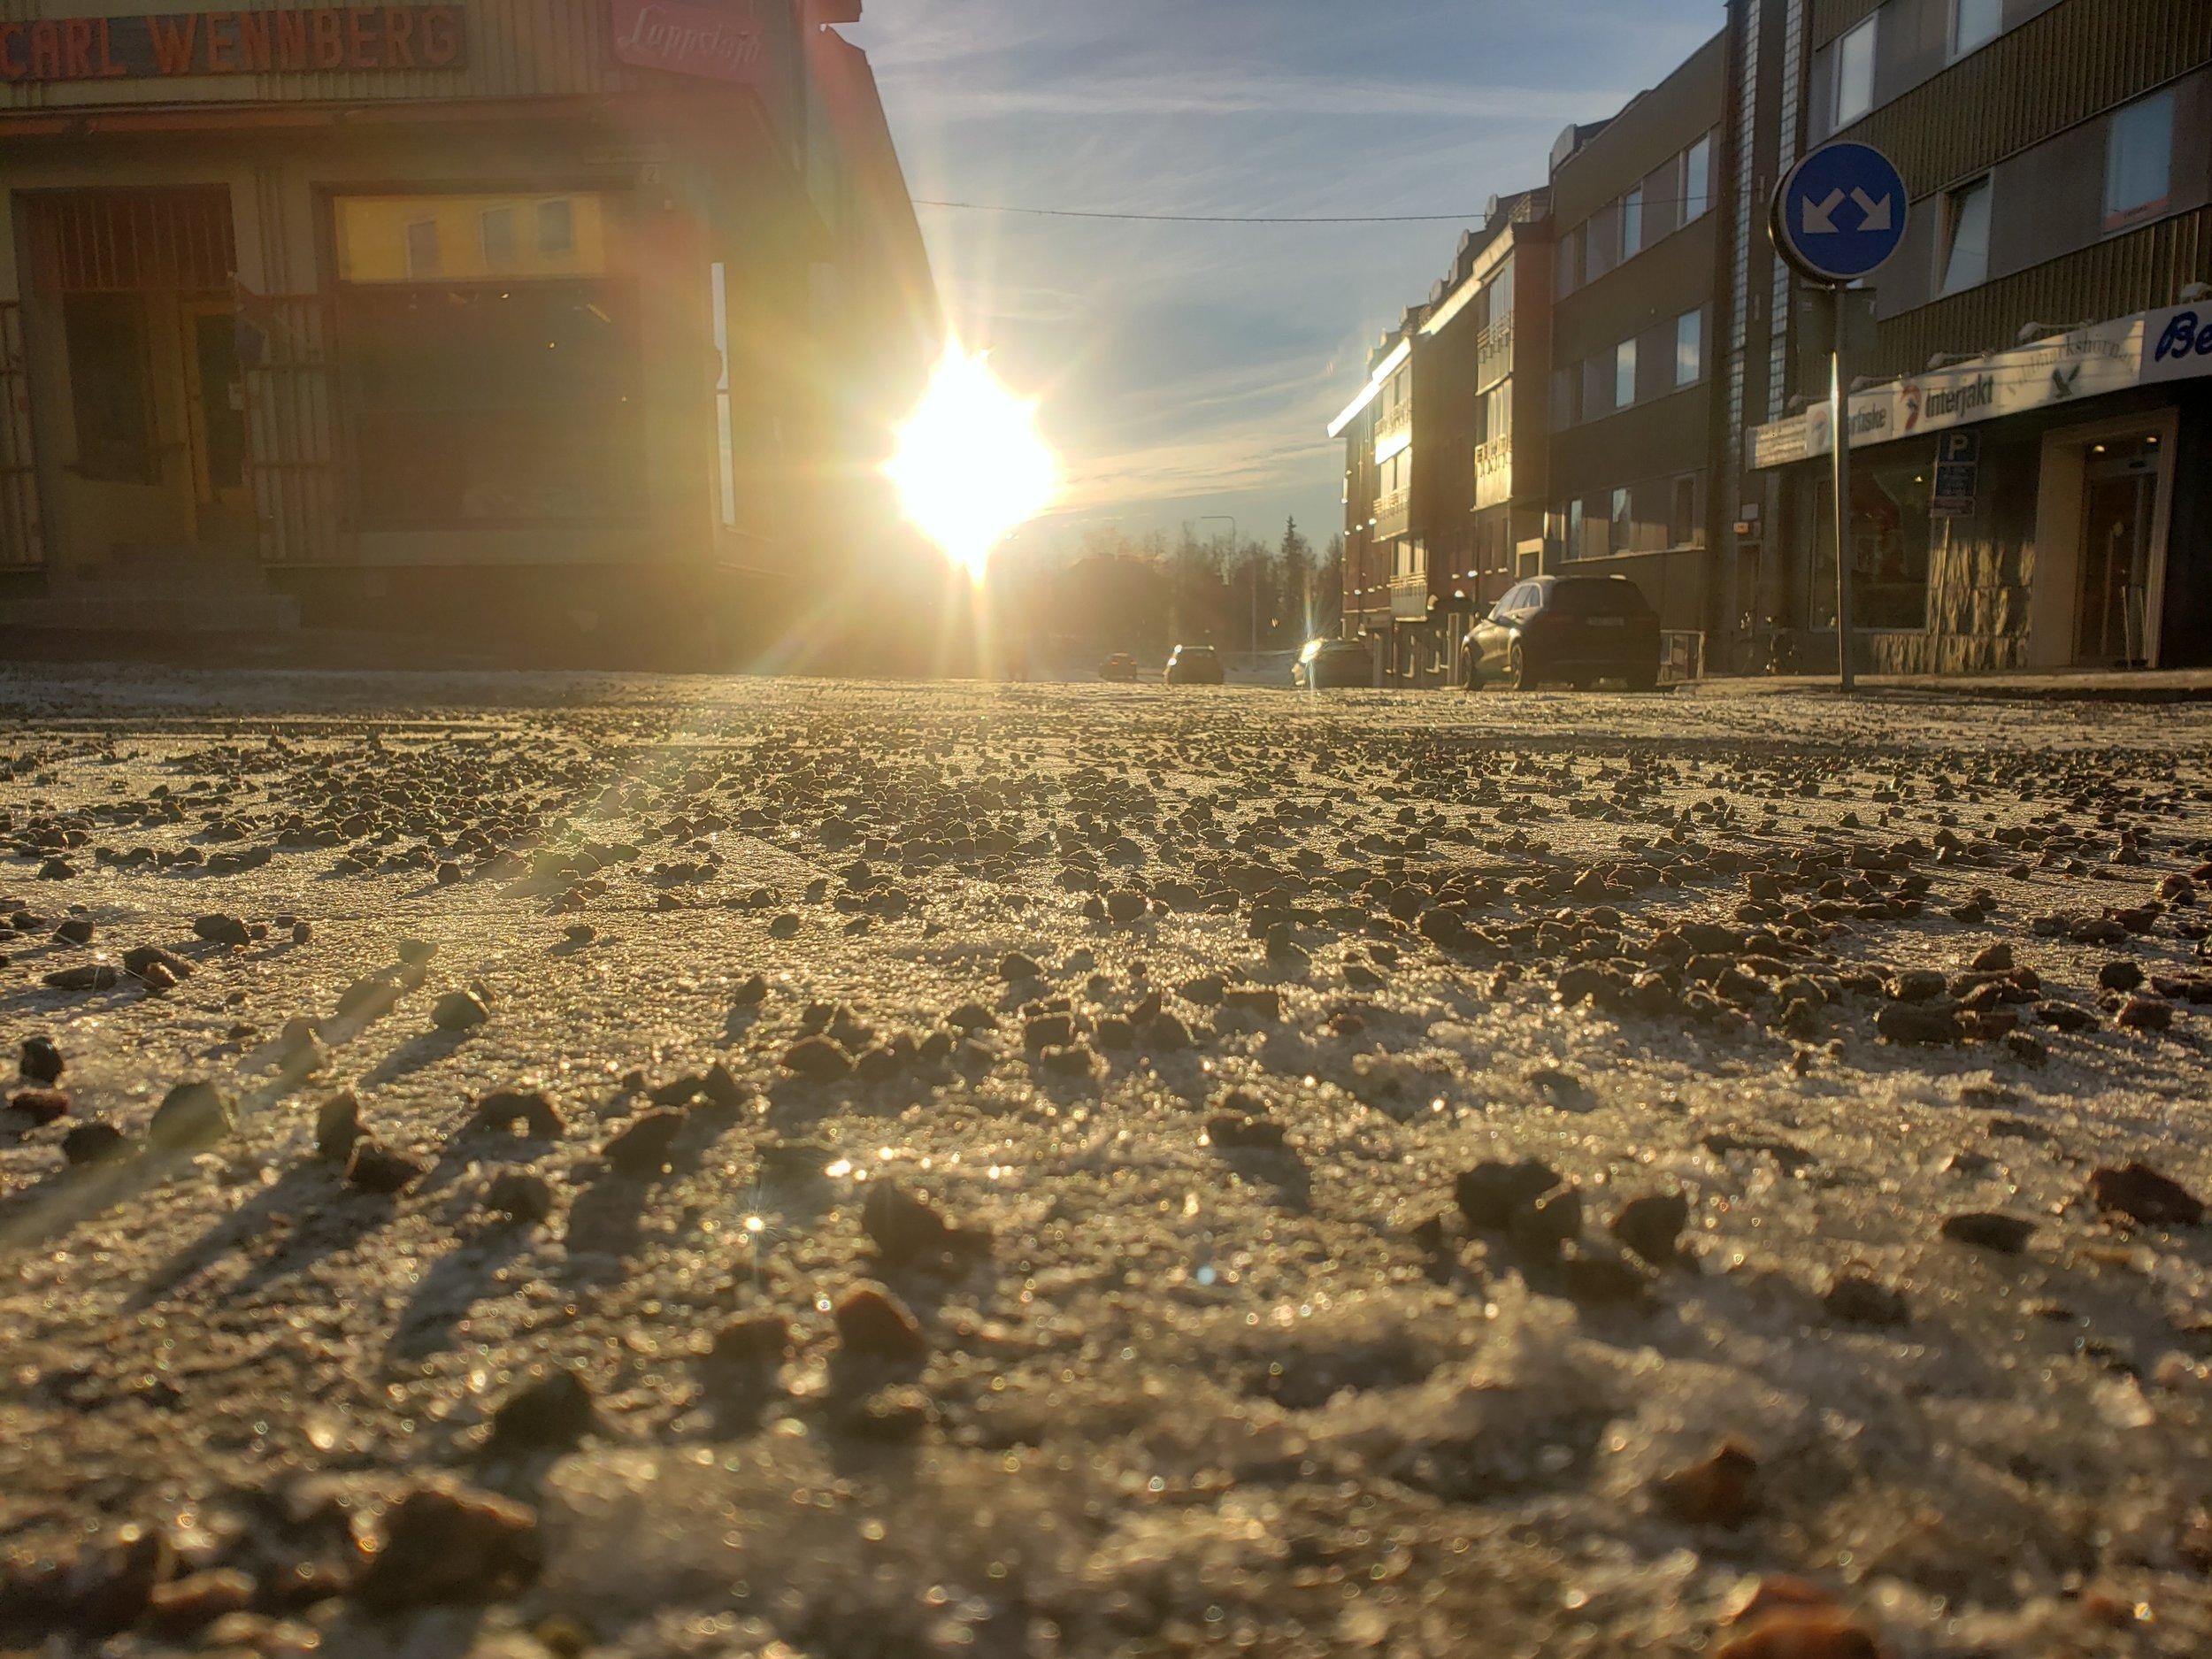 City of Kiruna